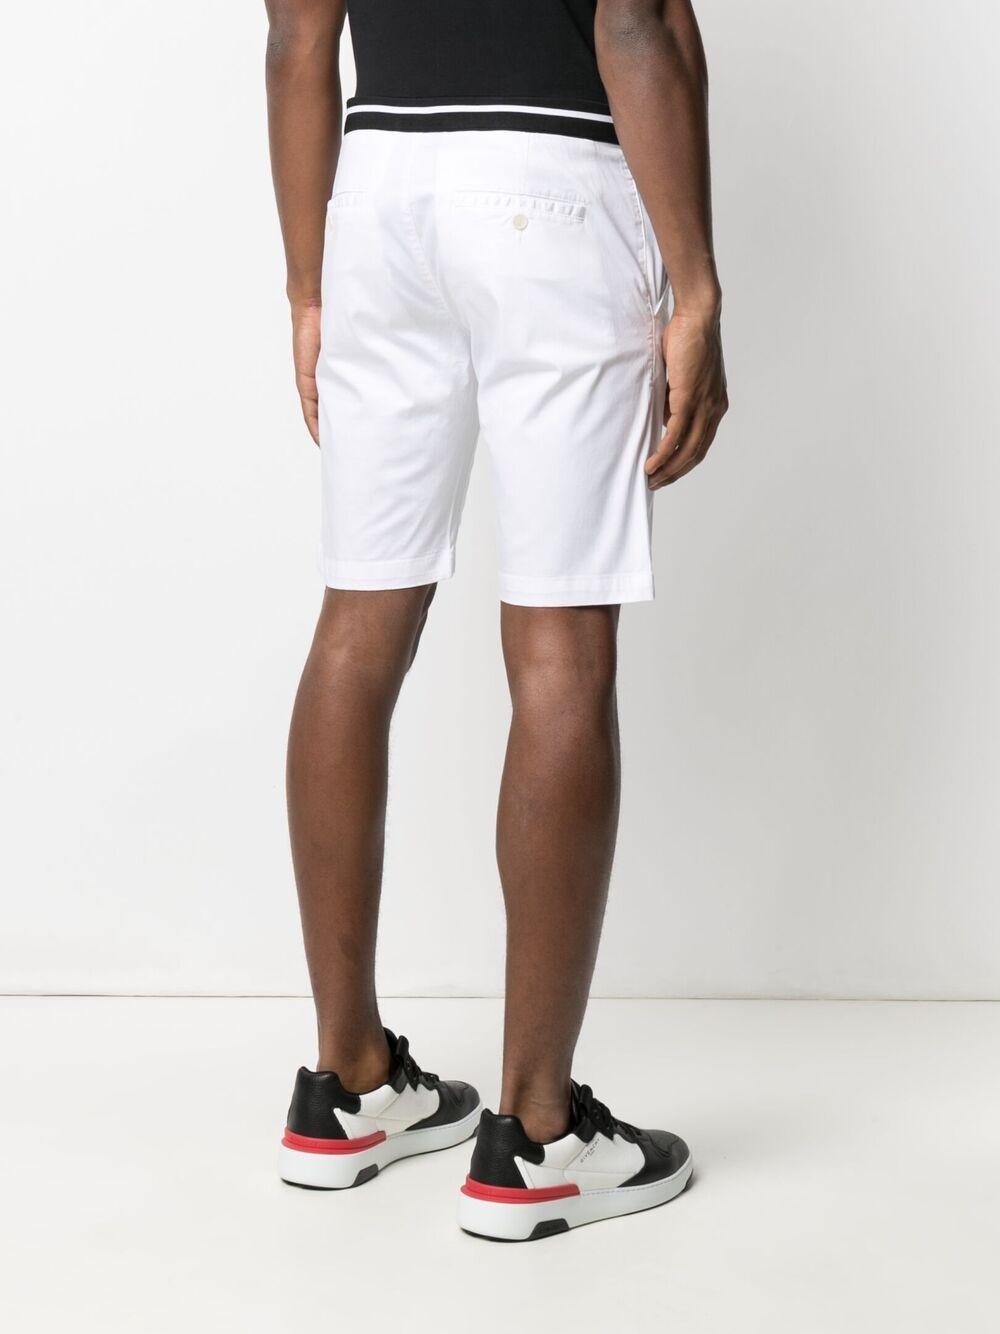 Karl Lagerfeld ribbed trim shorts - Weiß